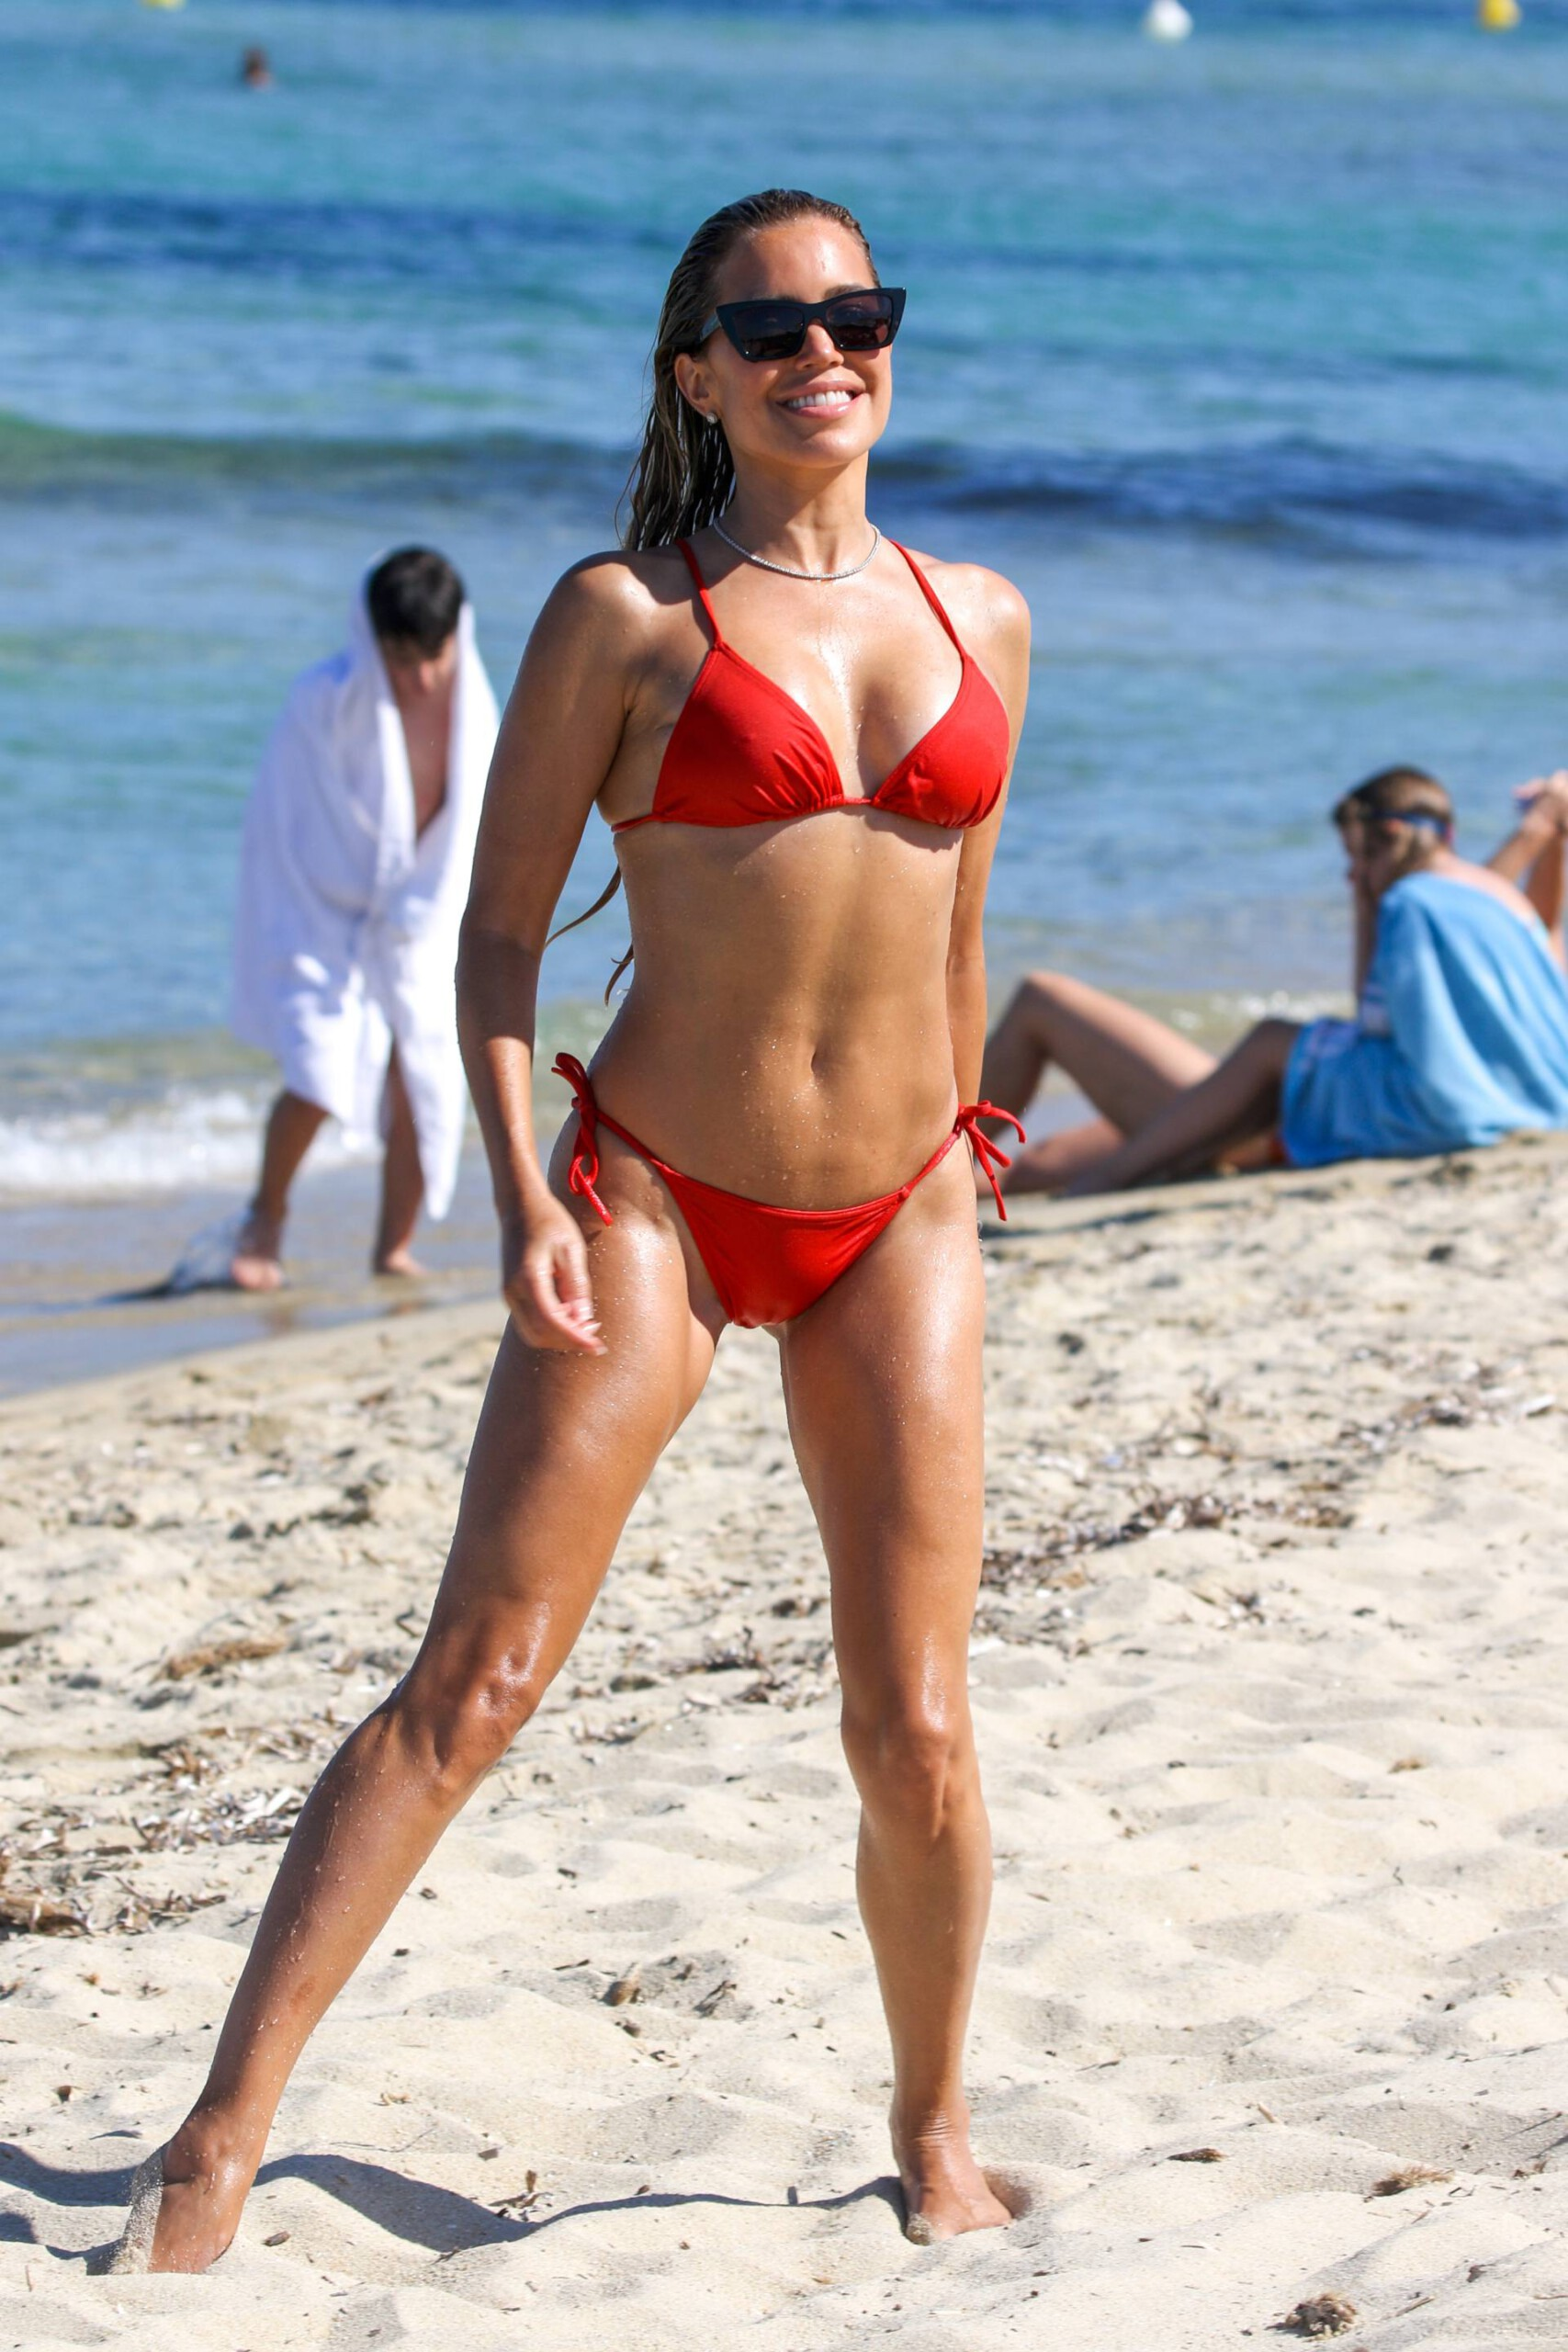 Sylvie Meis – Beautiful Body In Sexy Bikini On The Beach In Saint Tropez 0023